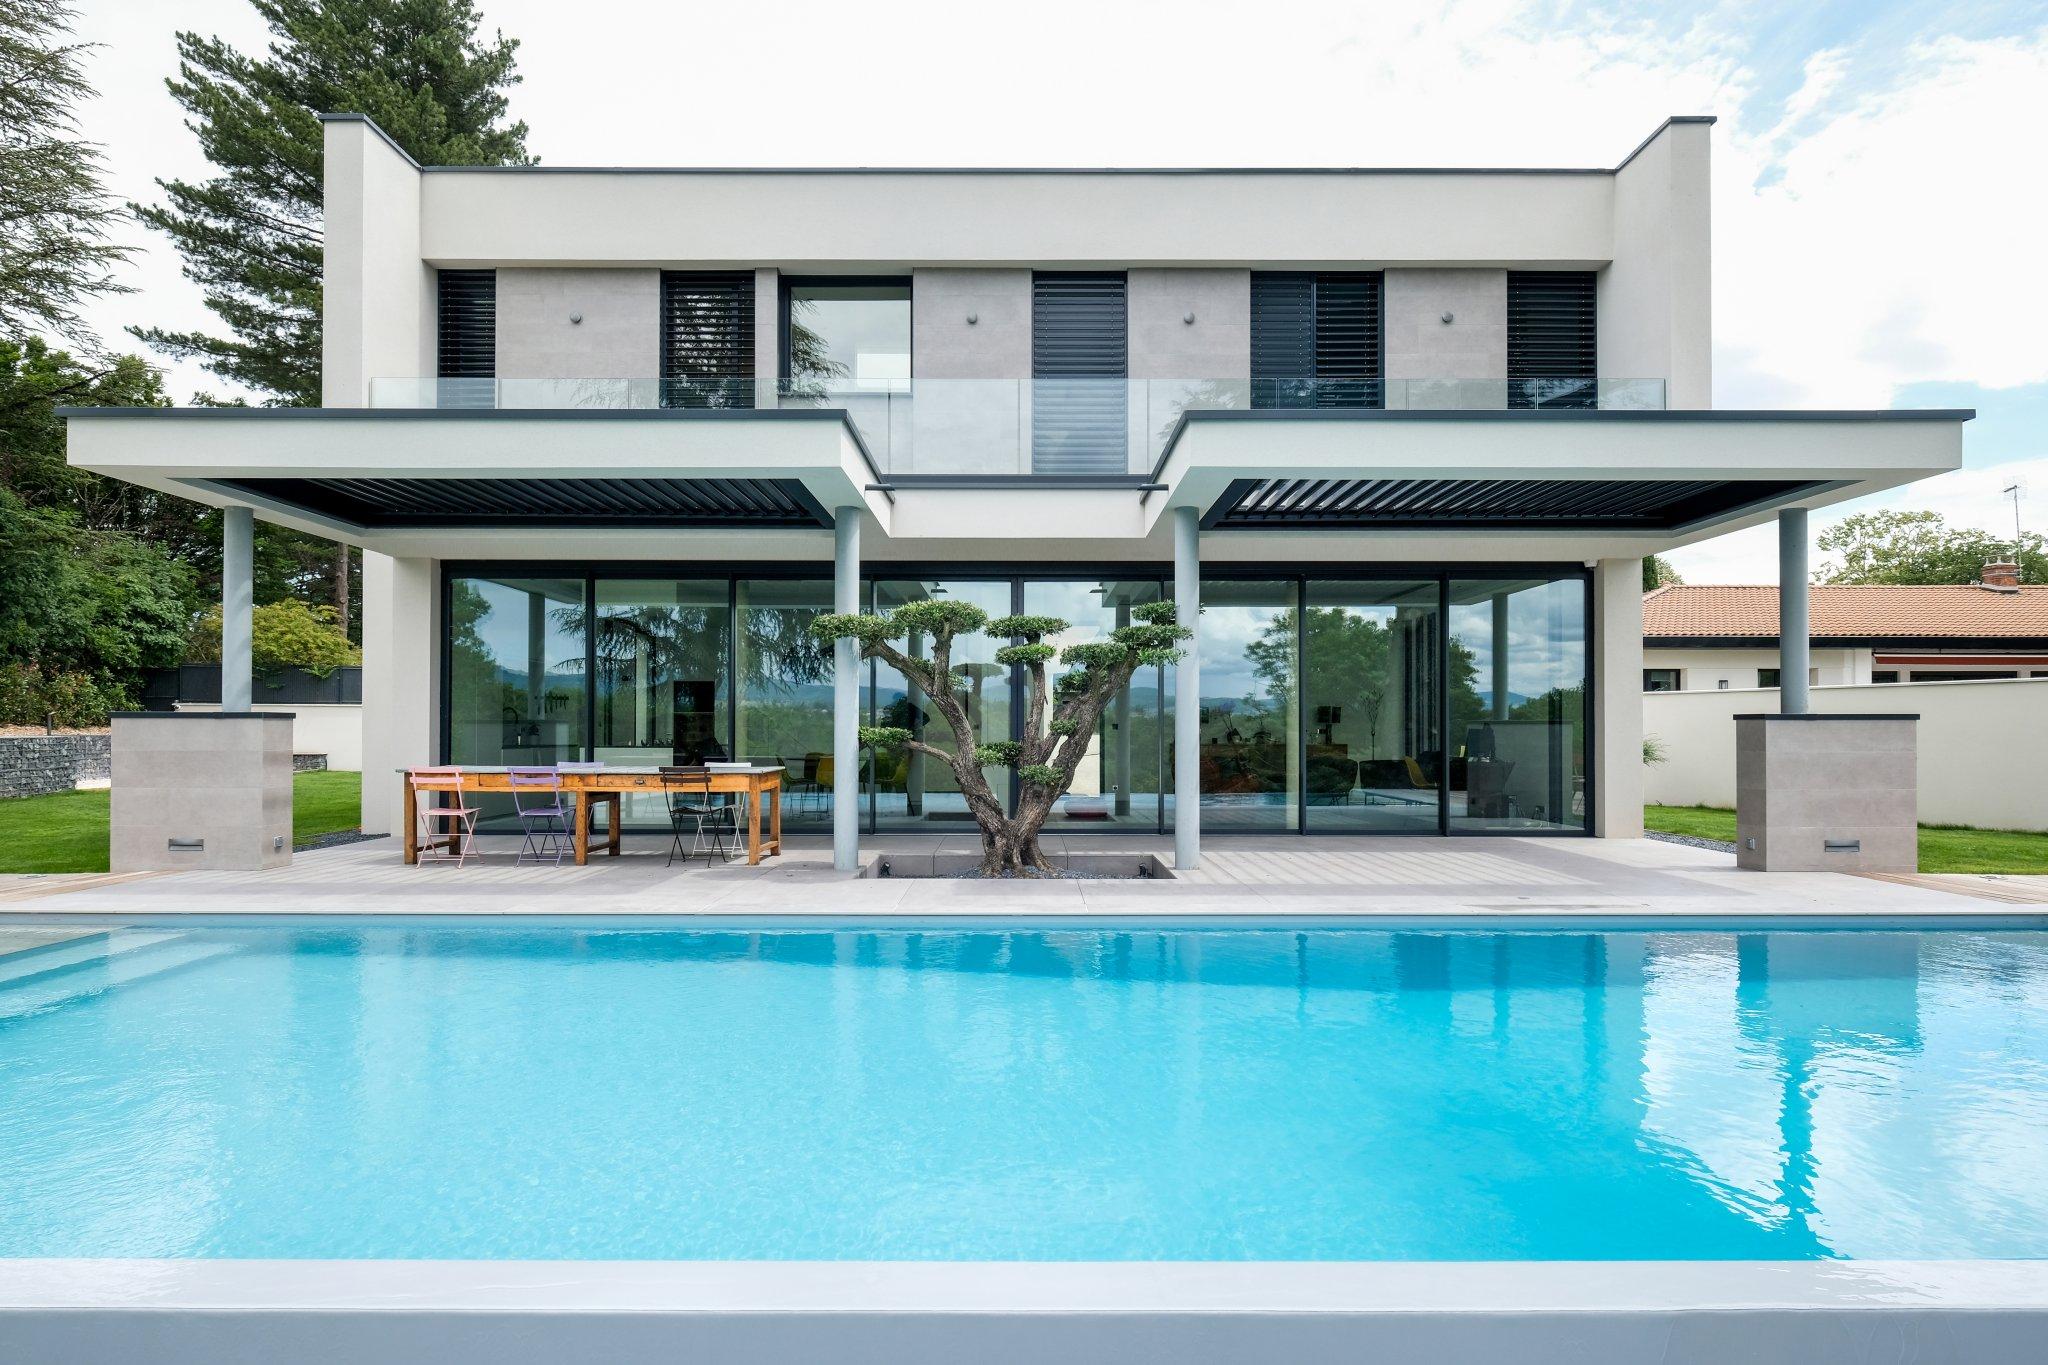 Maison Contemporaine.marlene Reynard.construction.neuve.piscine.toit Terrasse (5)